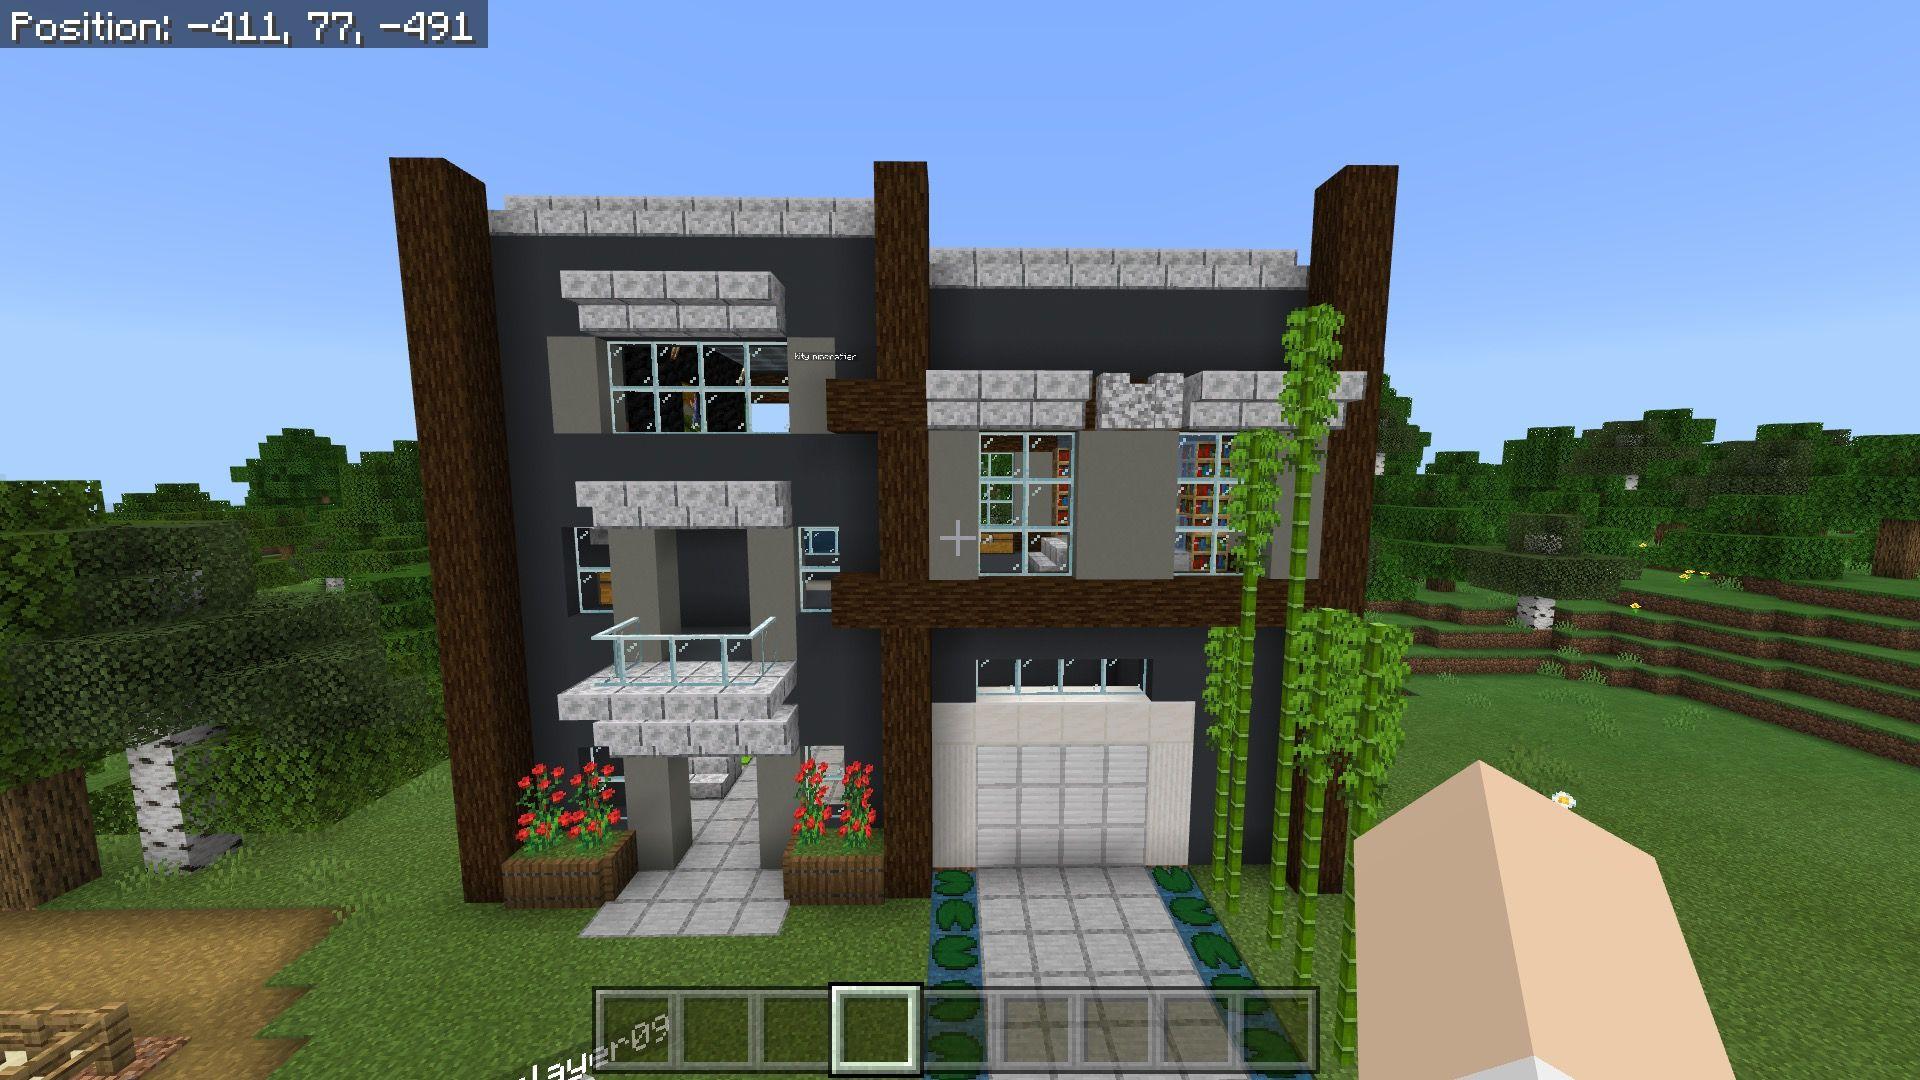 Pin By Alina Nieminen On Minecaft Minecraft Blueprints